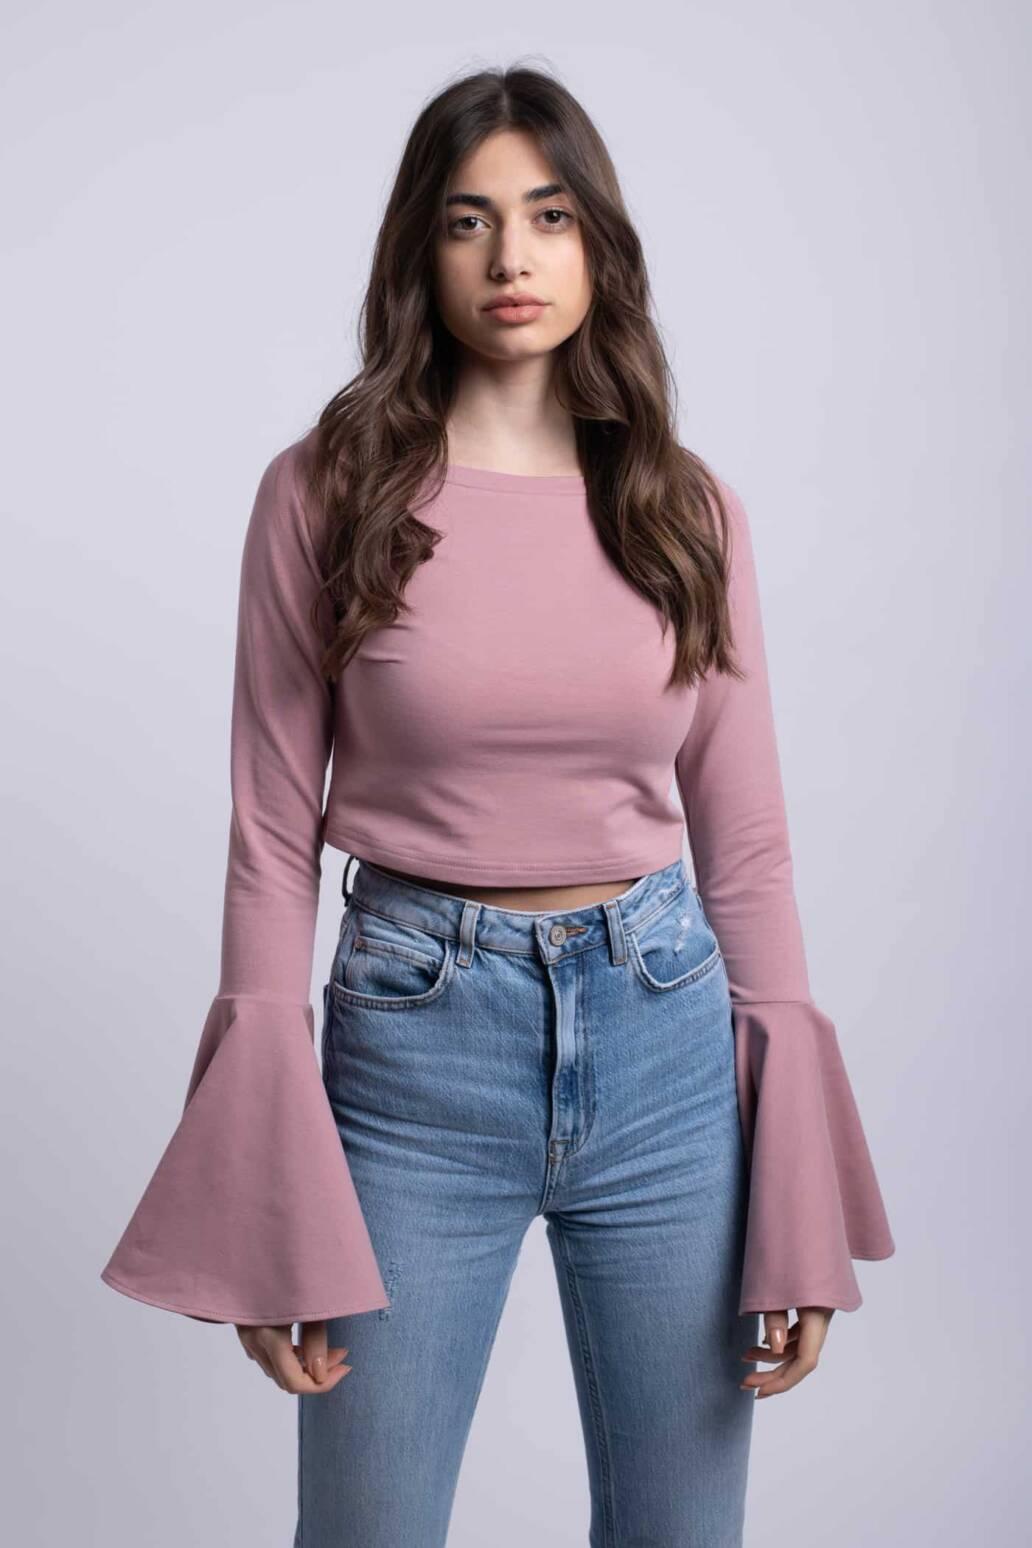 bluza roz pudra crop top simpla uai